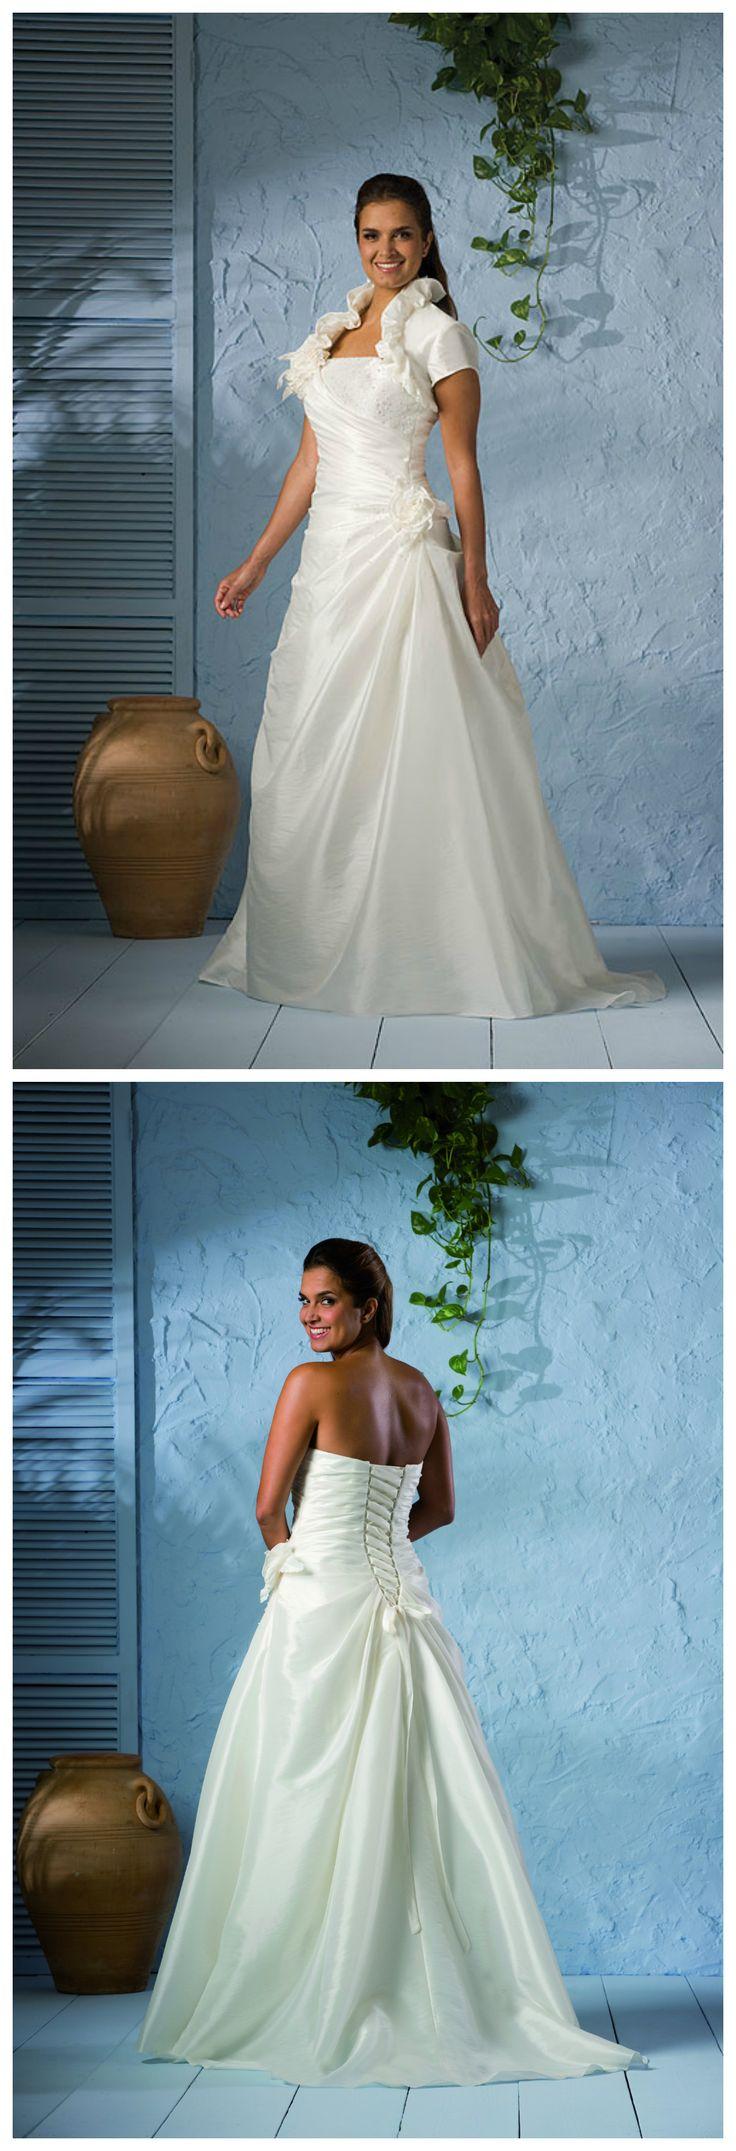 23 best Curvy Brides images on Pinterest   Curvy bride, Cork and Corks